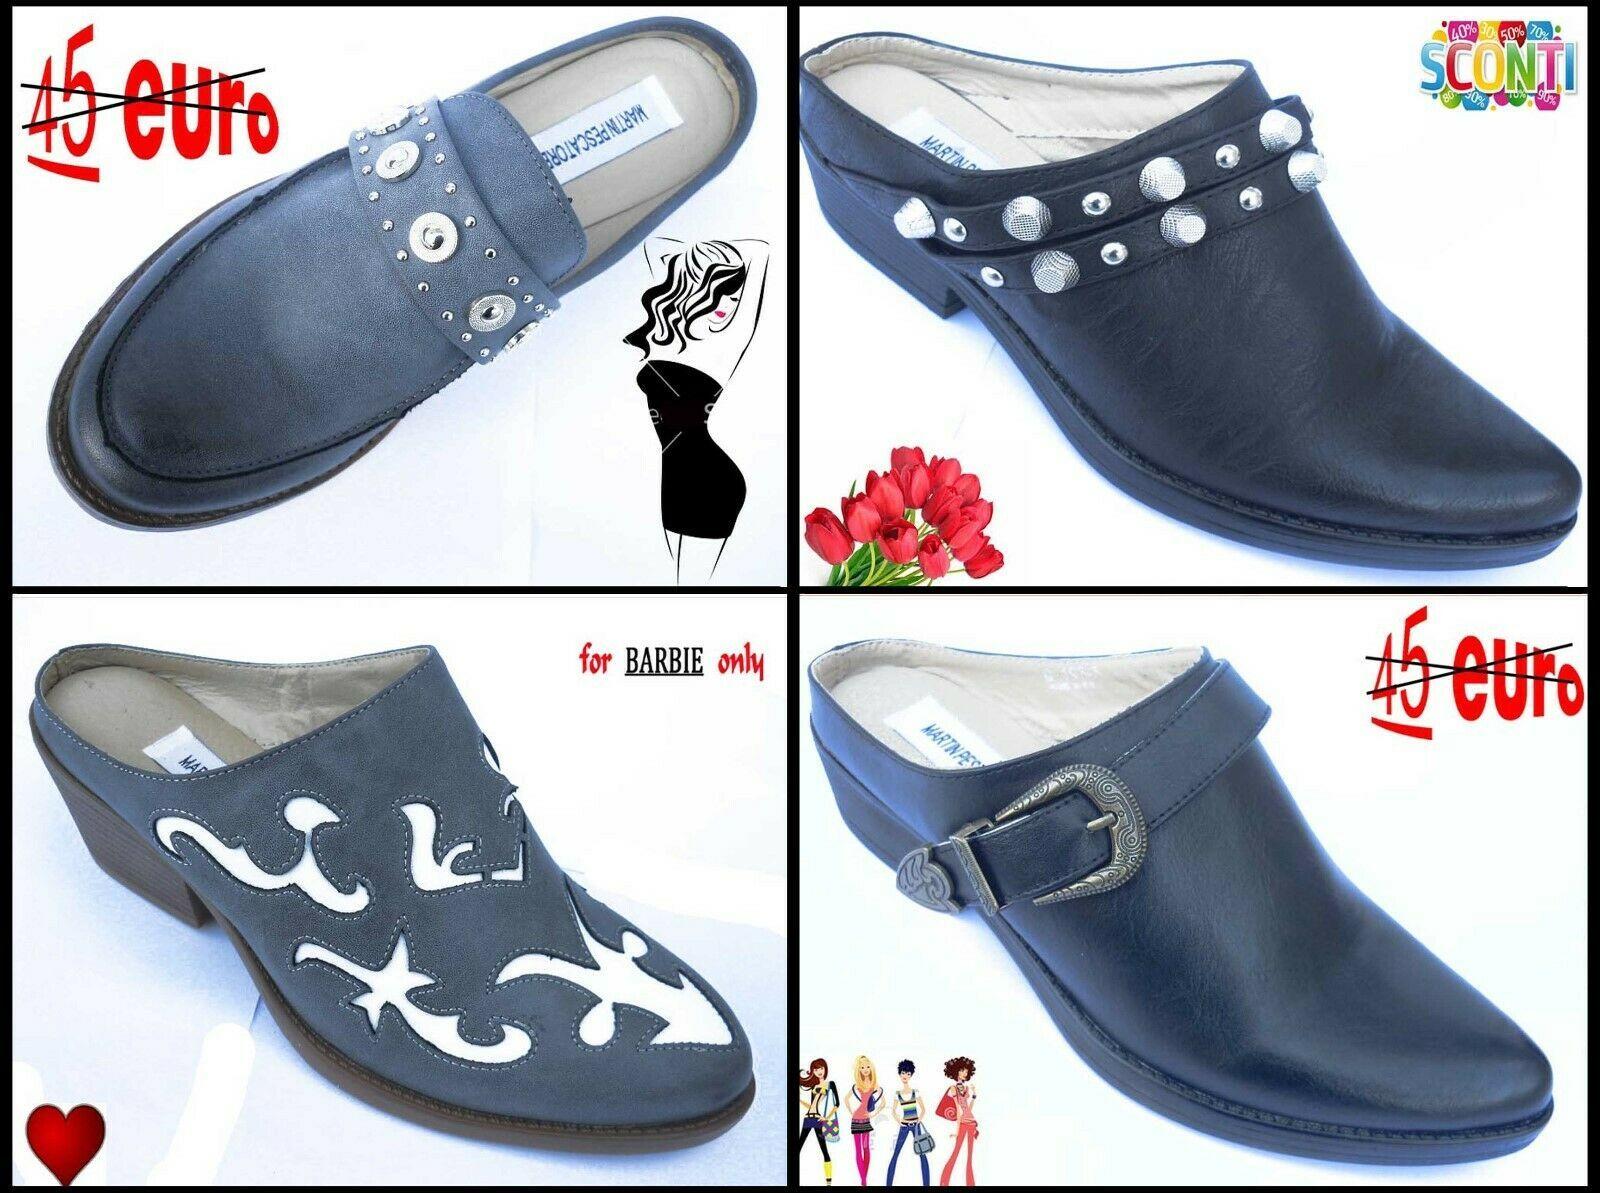 Photo of SABOT DONNA PANTOFOLE COWBOY TEXANI scarpe donna -50% INGROSSO  – Scarpe Tacco -…